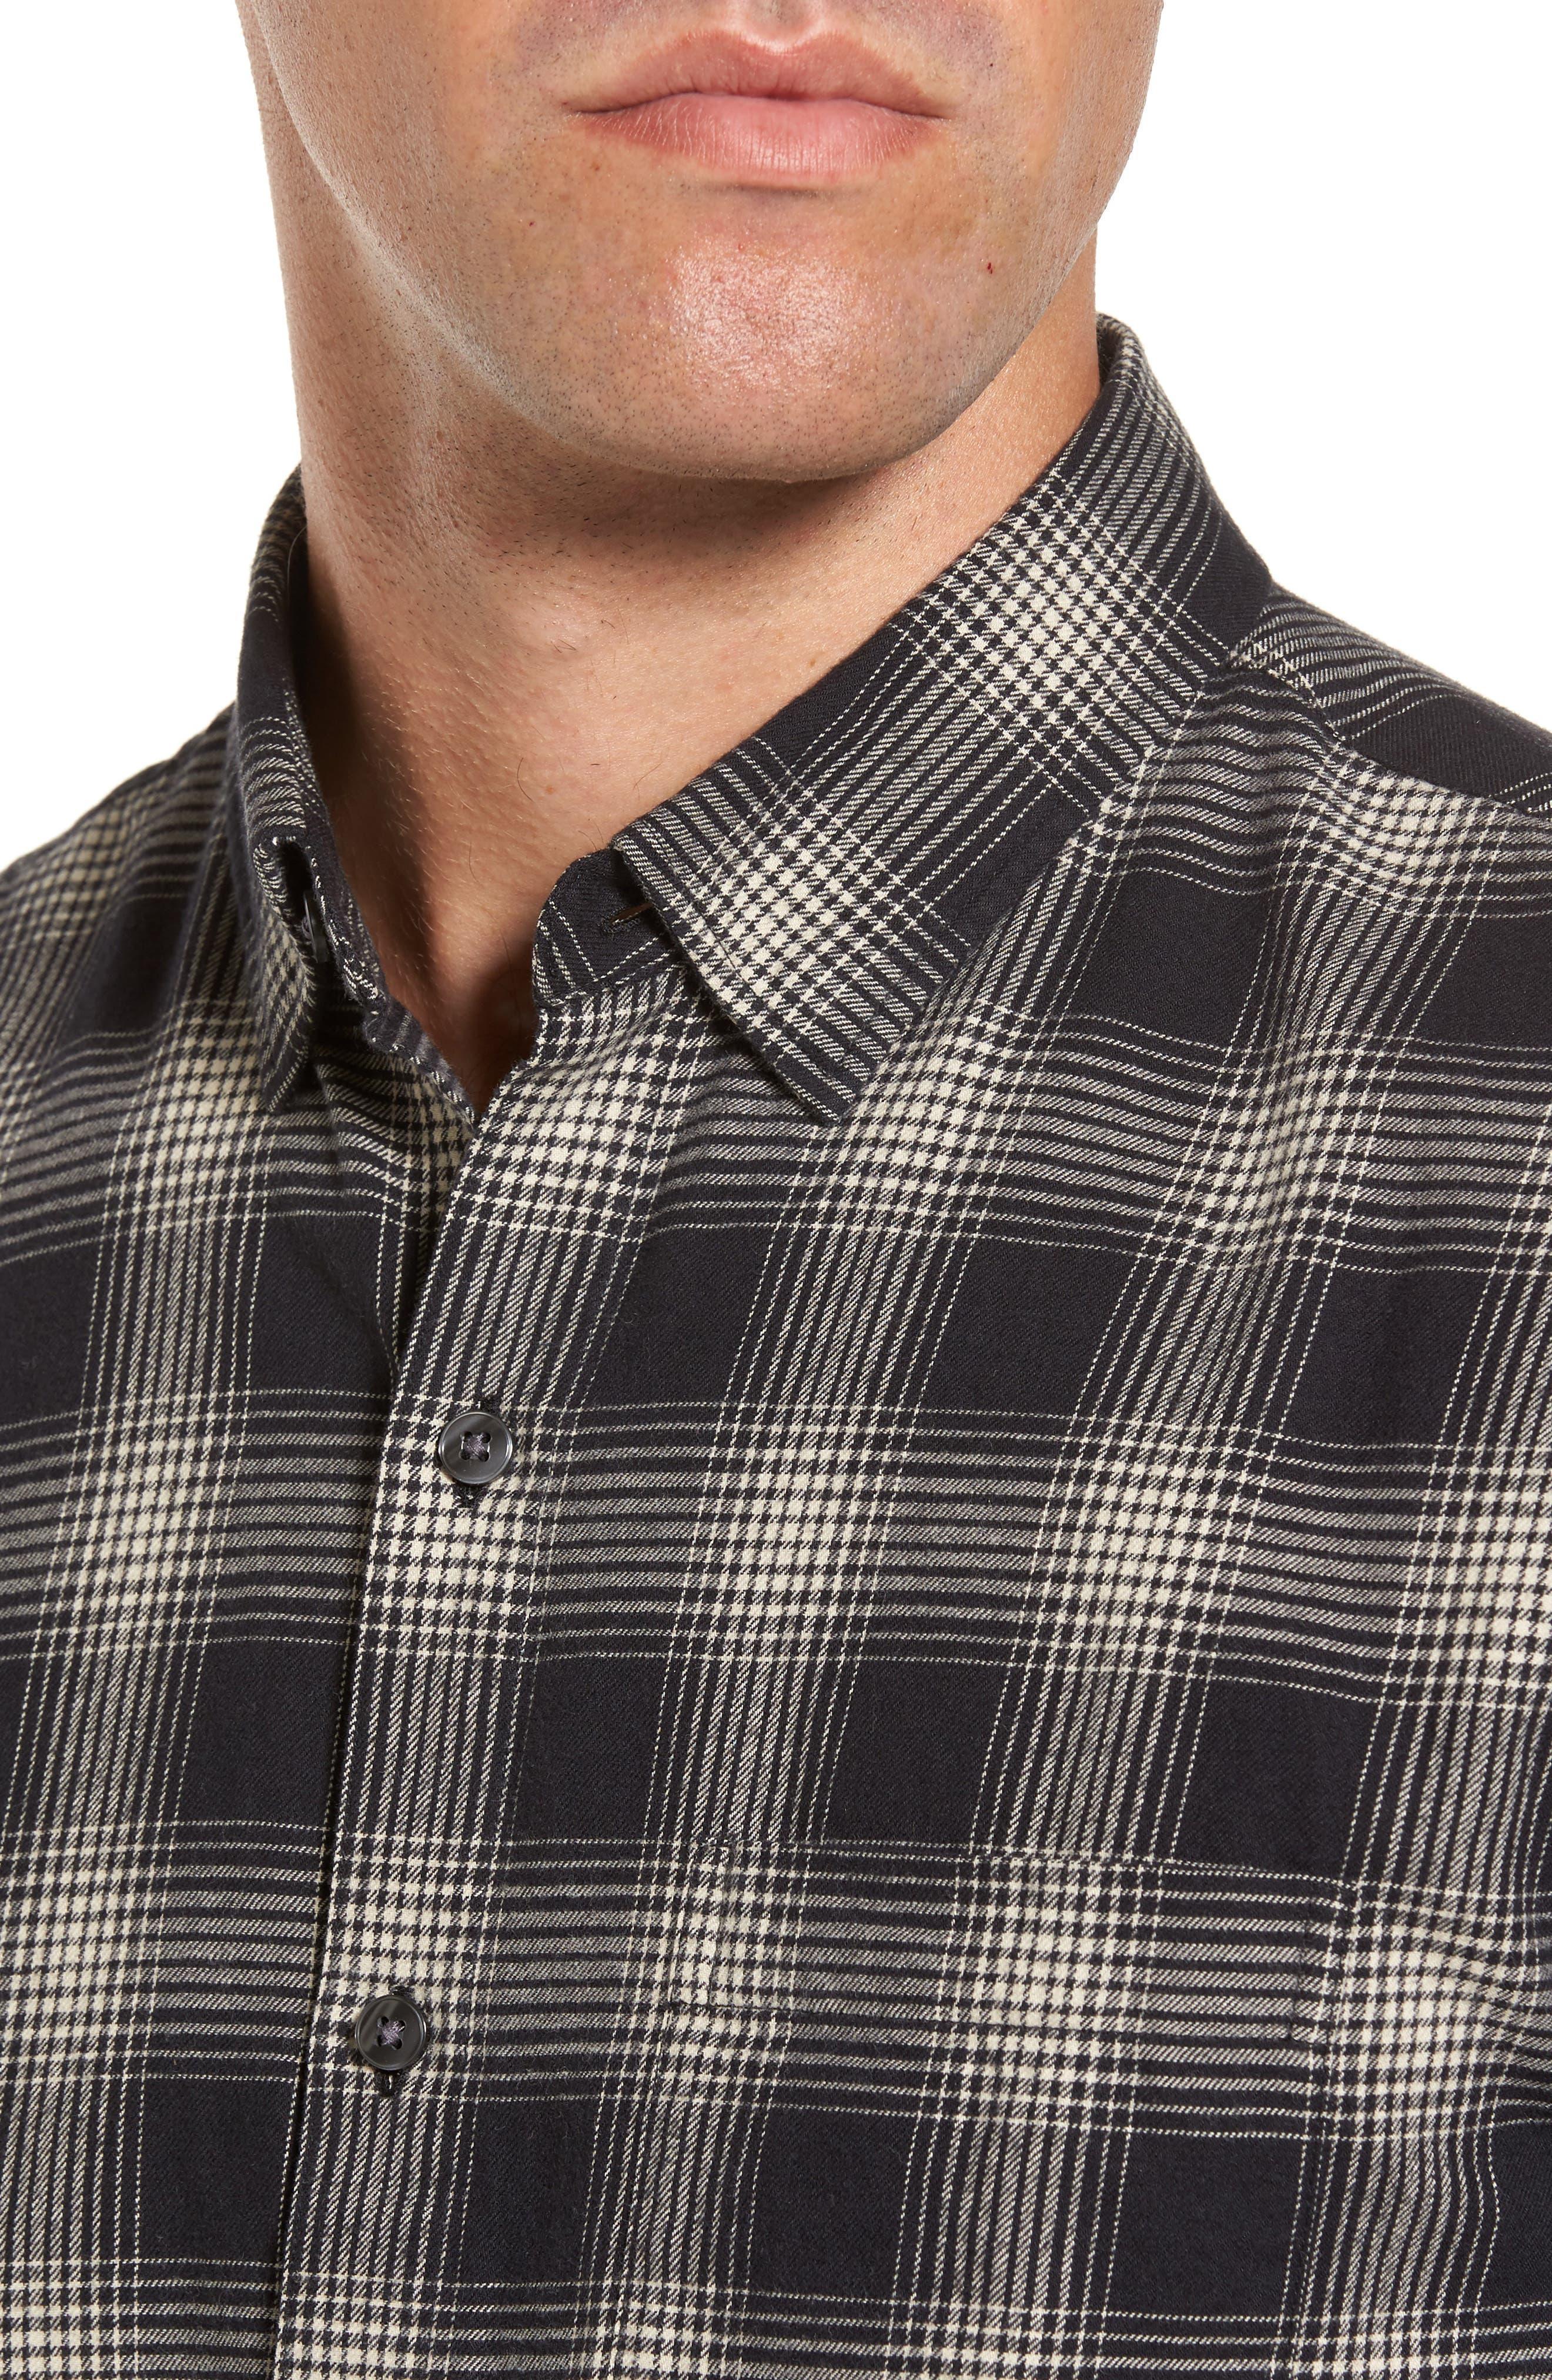 Slim Fit Plaid Brushed Twill Sport Shirt,                             Alternate thumbnail 4, color,                             Black/ Brown Plaid